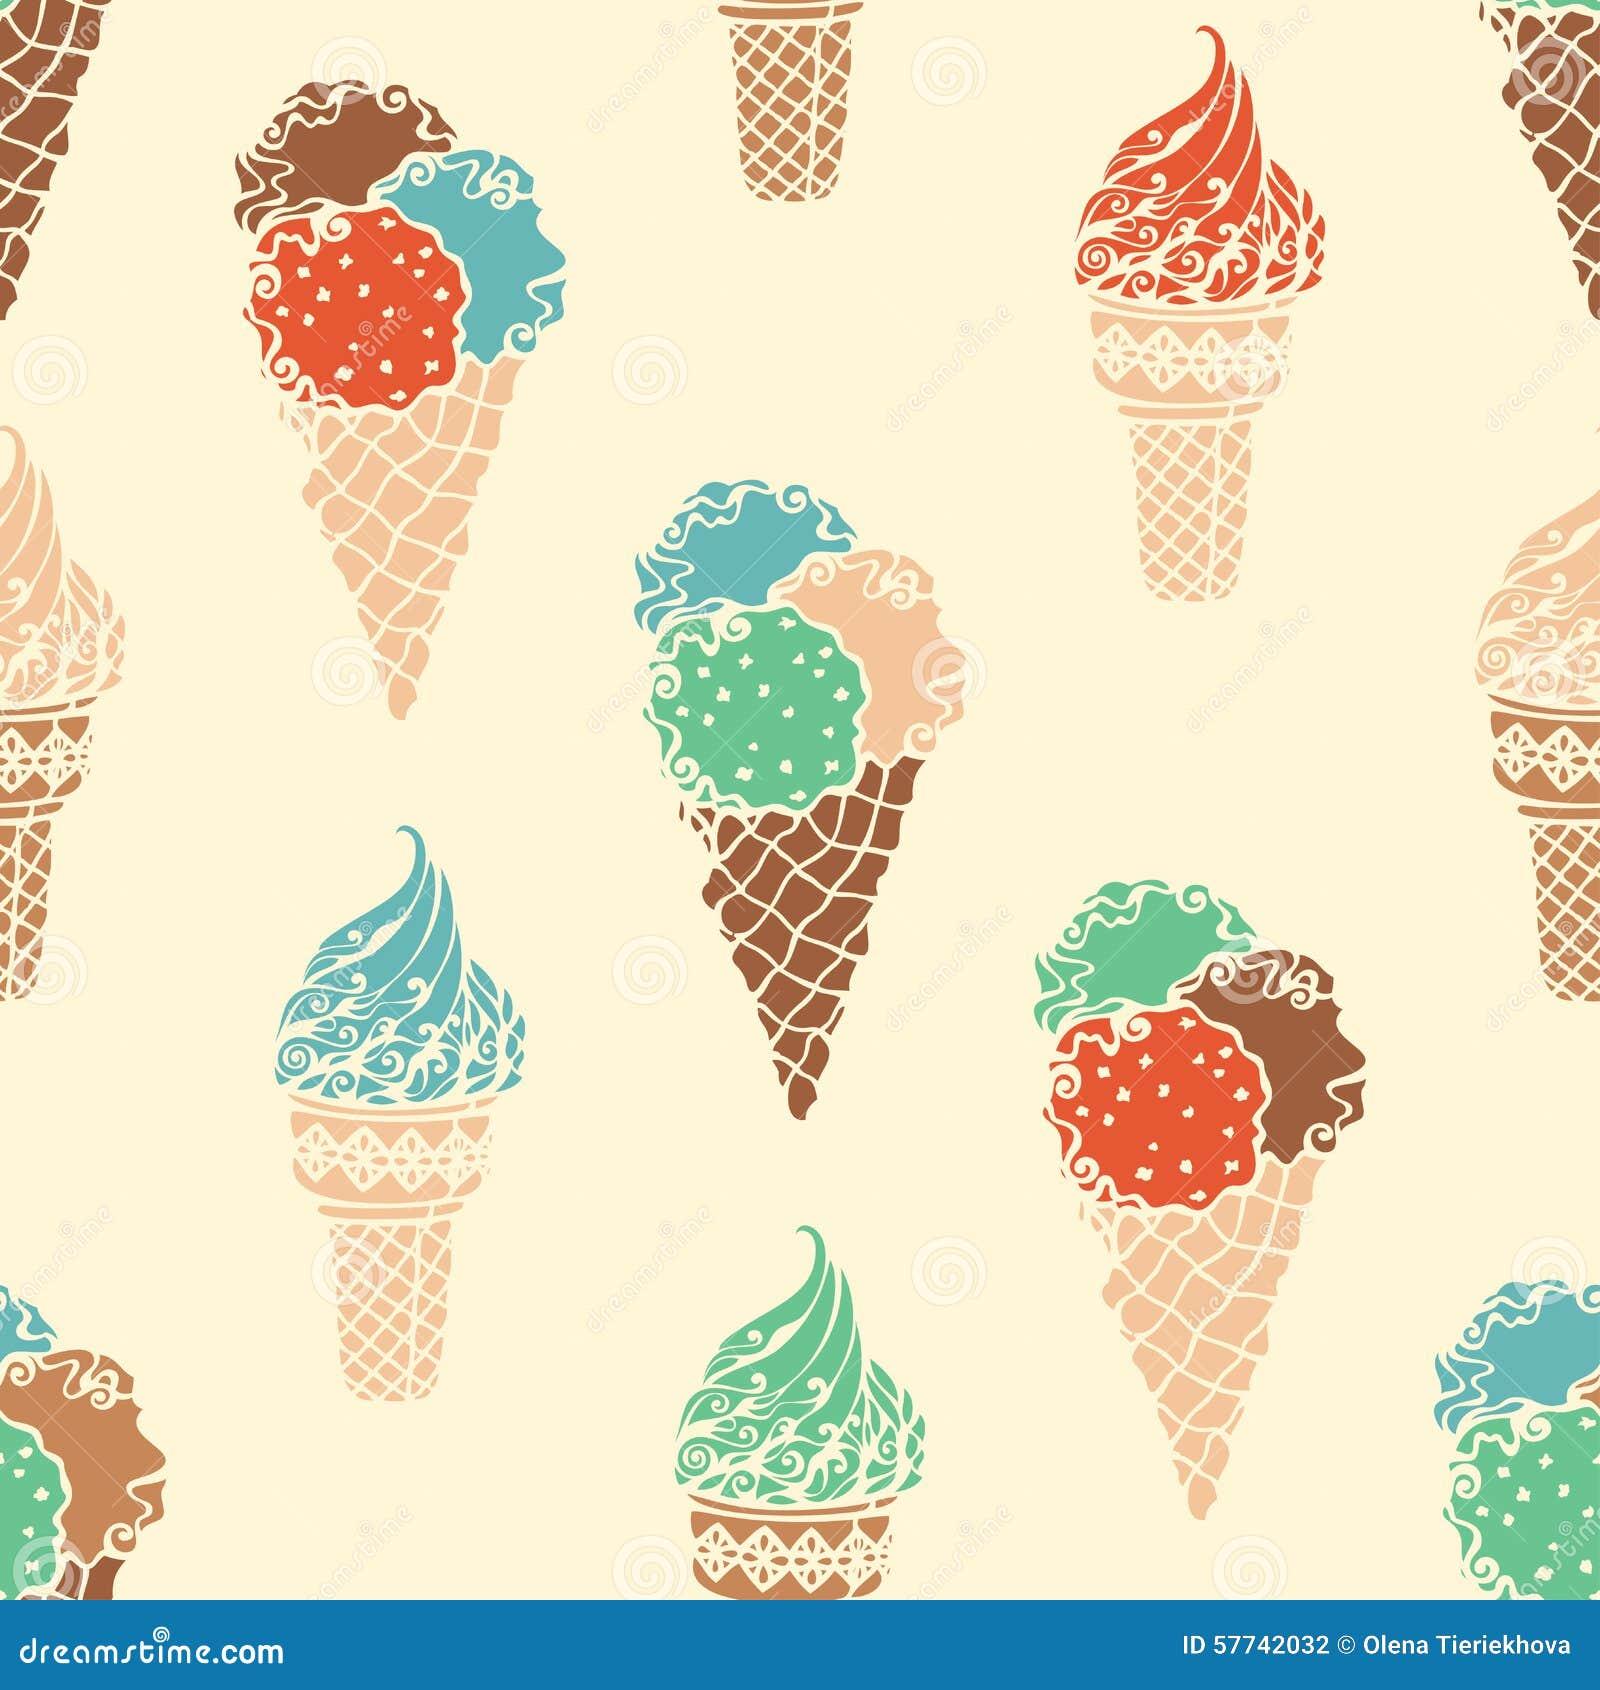 Seamless Ice Cream Background Vintage Style: Seamless Retro Ice-cream Pattern. Stock Vector